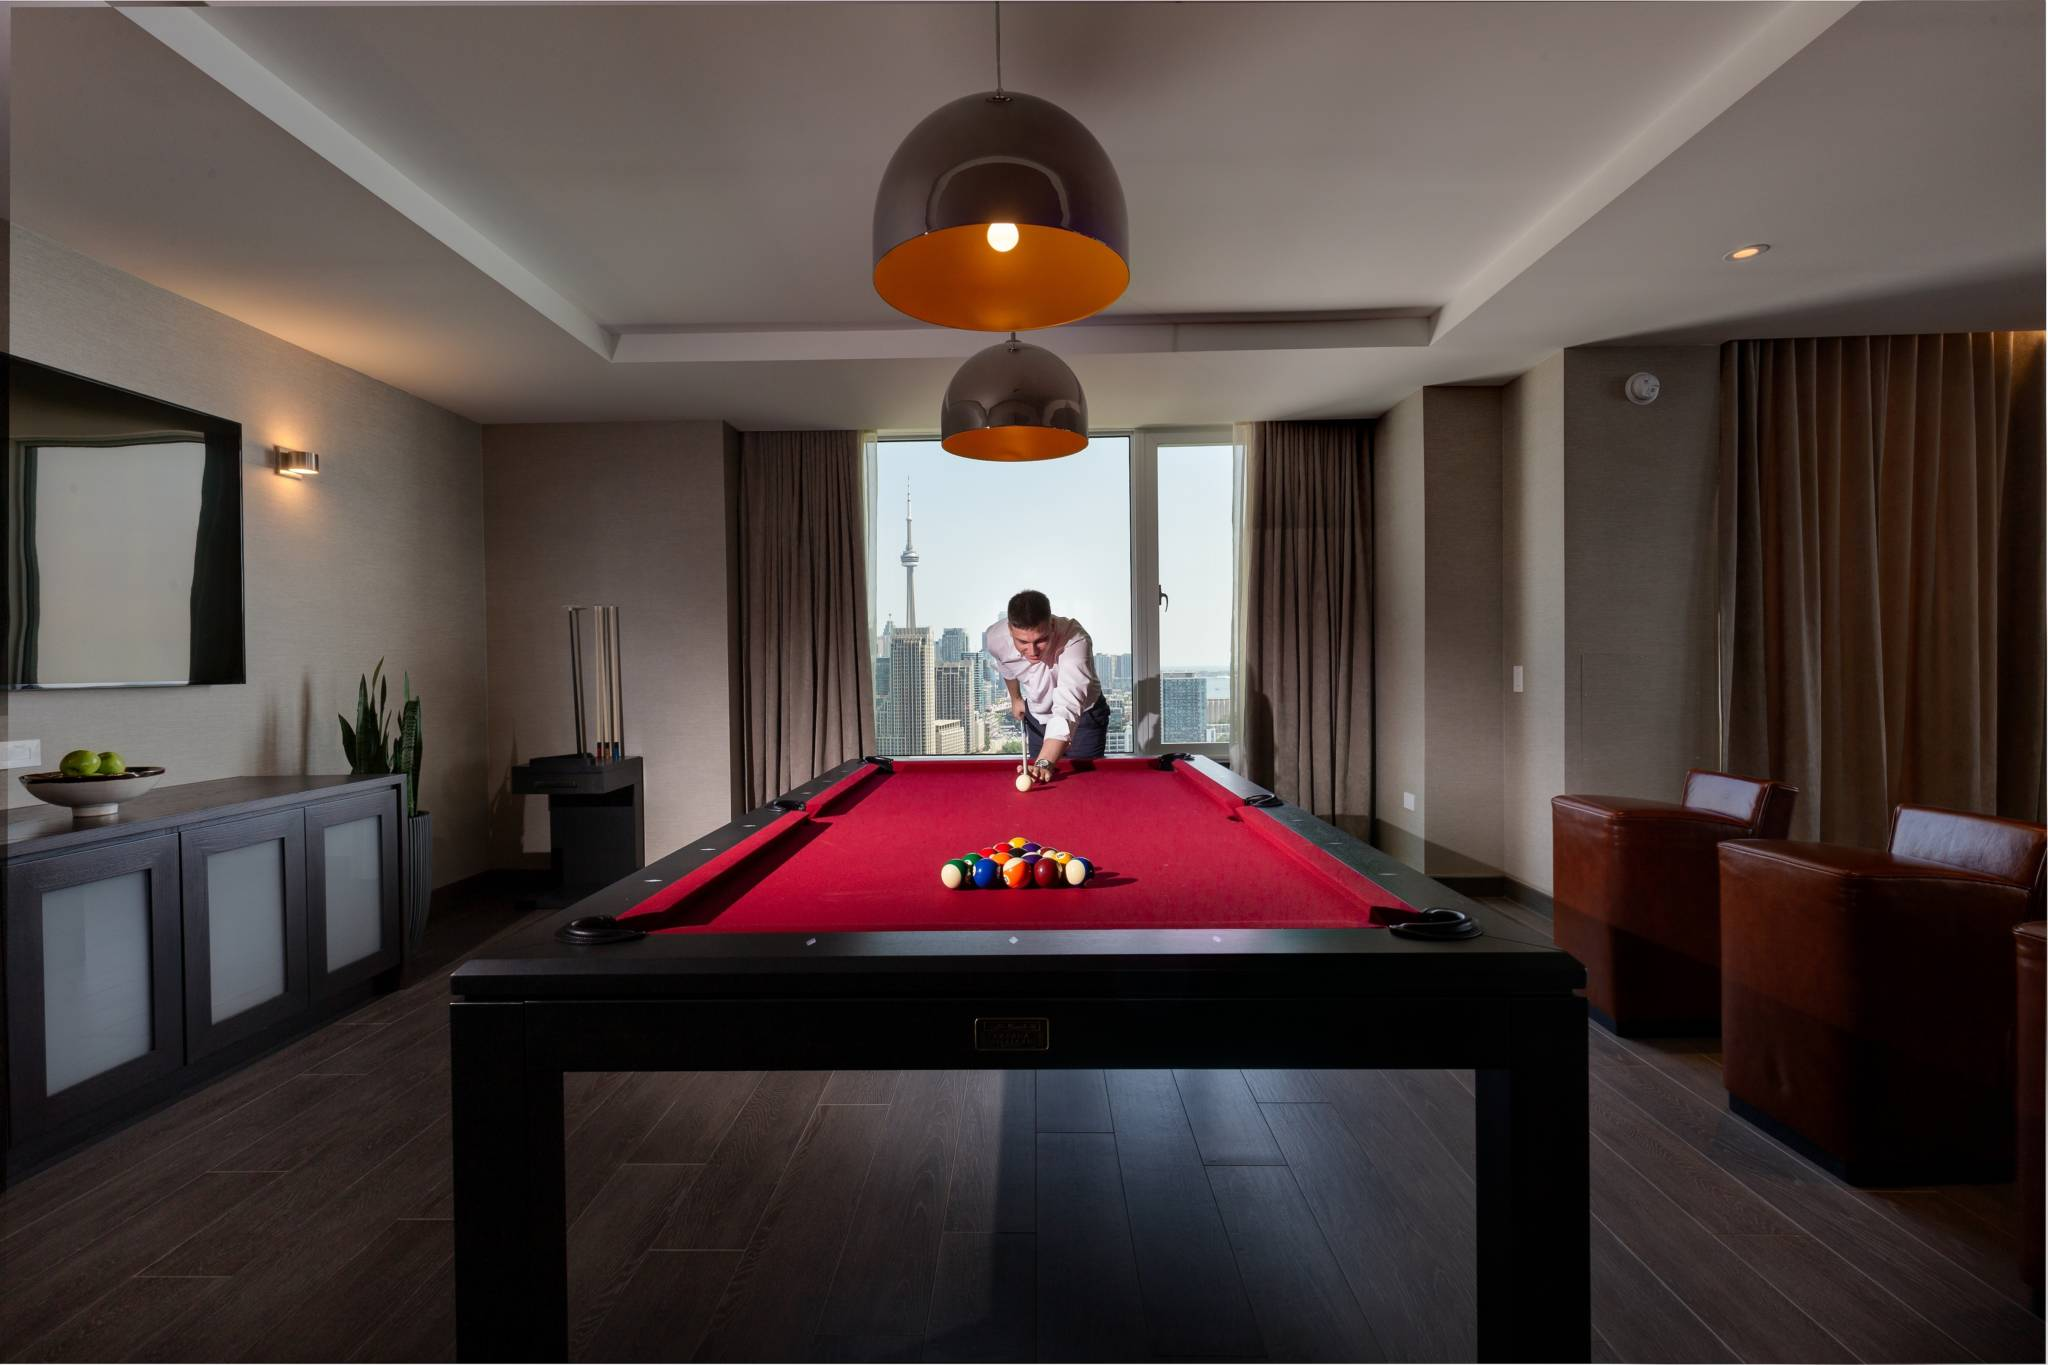 6000 a night toronto hotel x 9